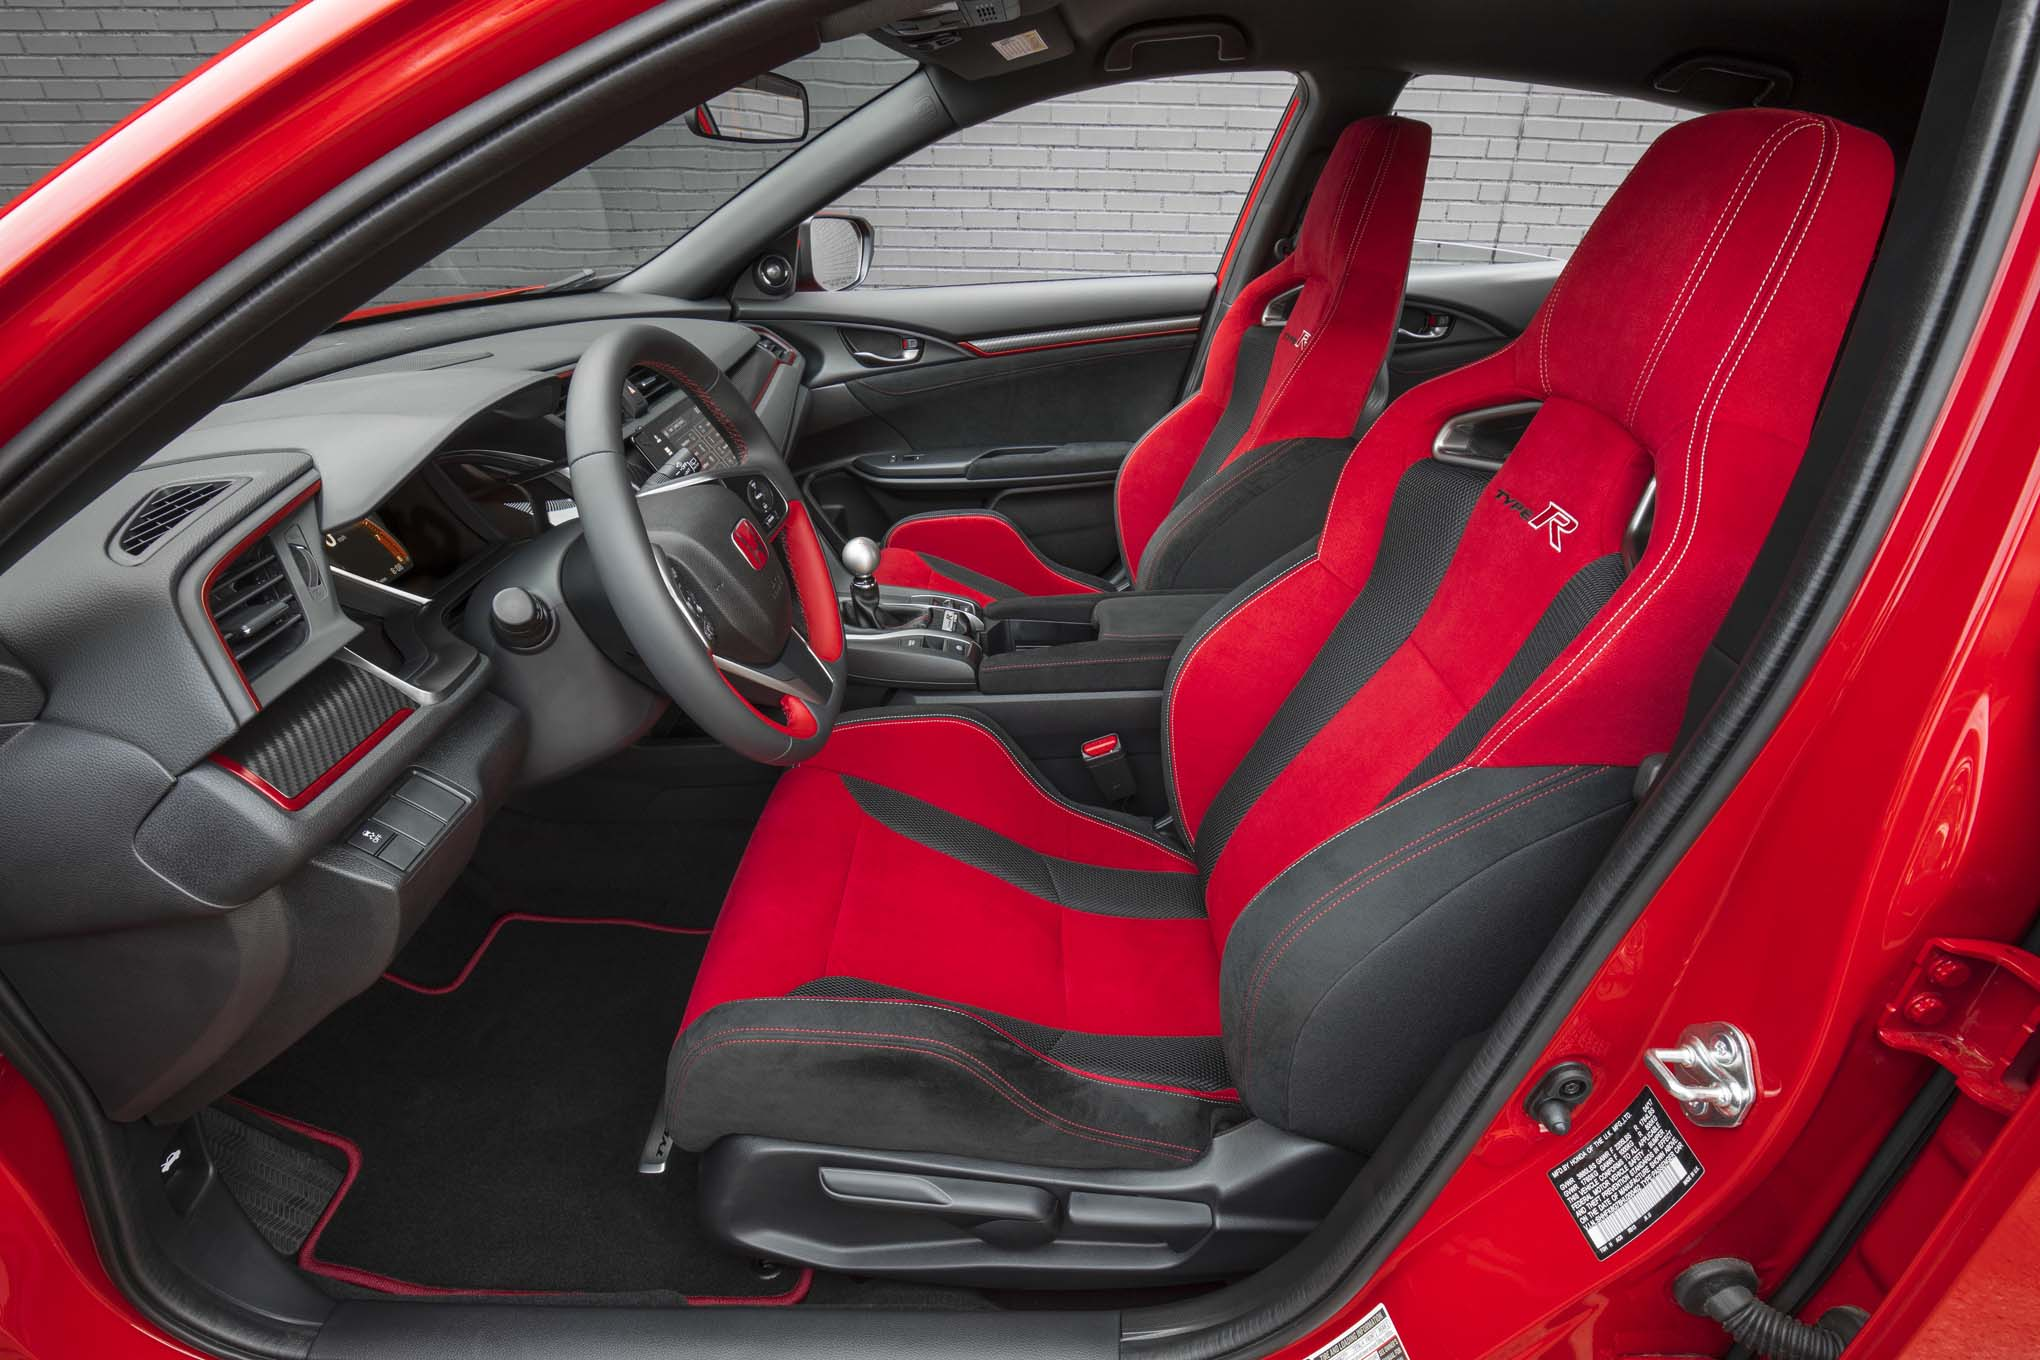 2017 honda civic type r pro racer 39 s analysis automobile magazine for 2004 honda civic interior parts